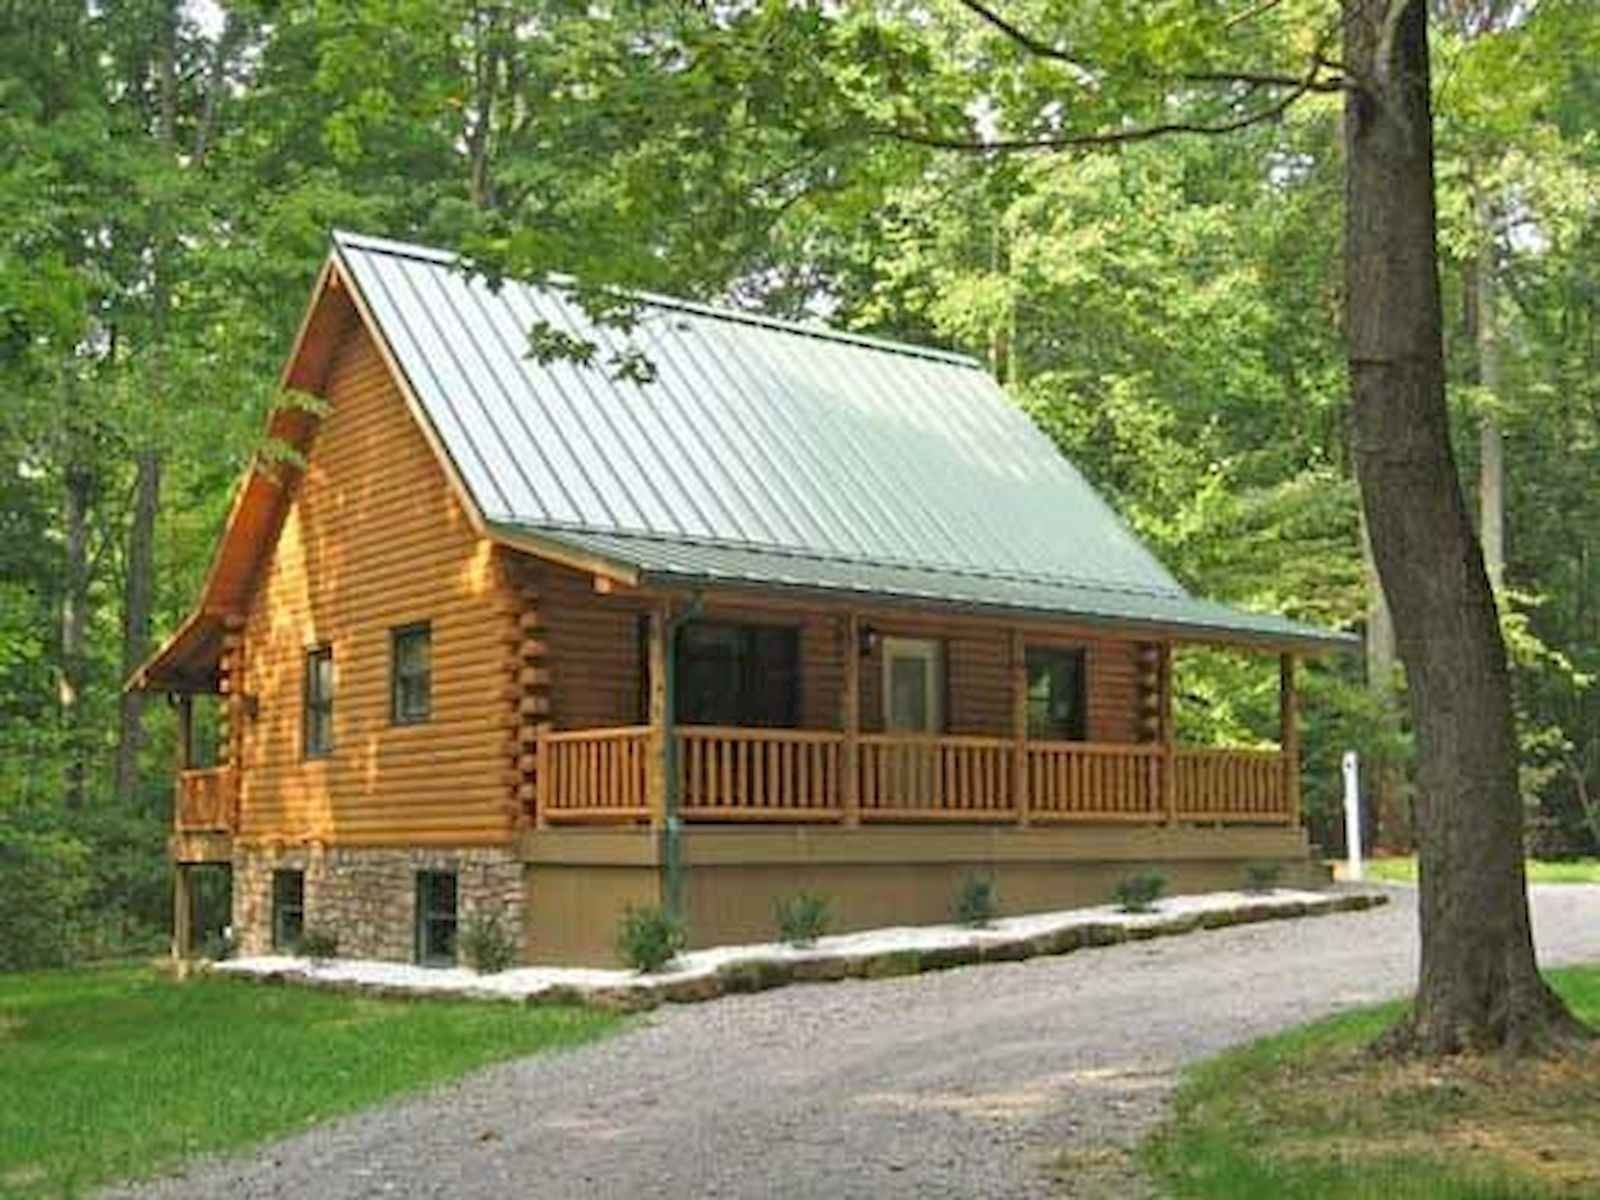 75 Best Log Cabin Homes Plans Design Ideas Small Log Cabin Plans Log Cabin Plans Log Cabin Floor Plans